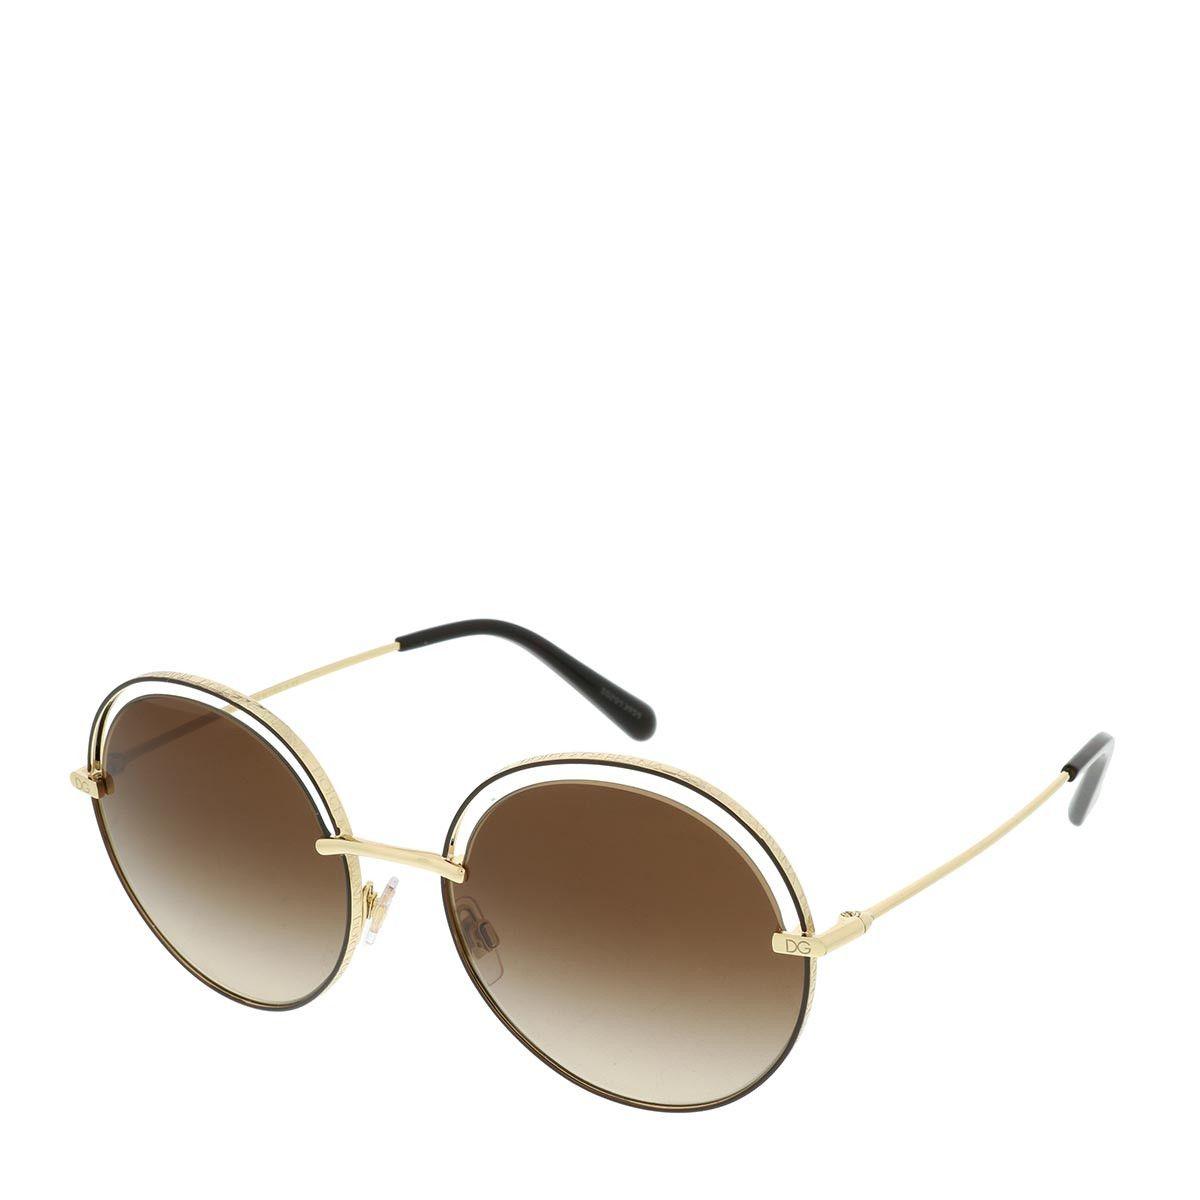 Dolce&Gabbana 0DG2262 134413 Woman Sunglasses Charisma Gold/Brown Sonnenbrille